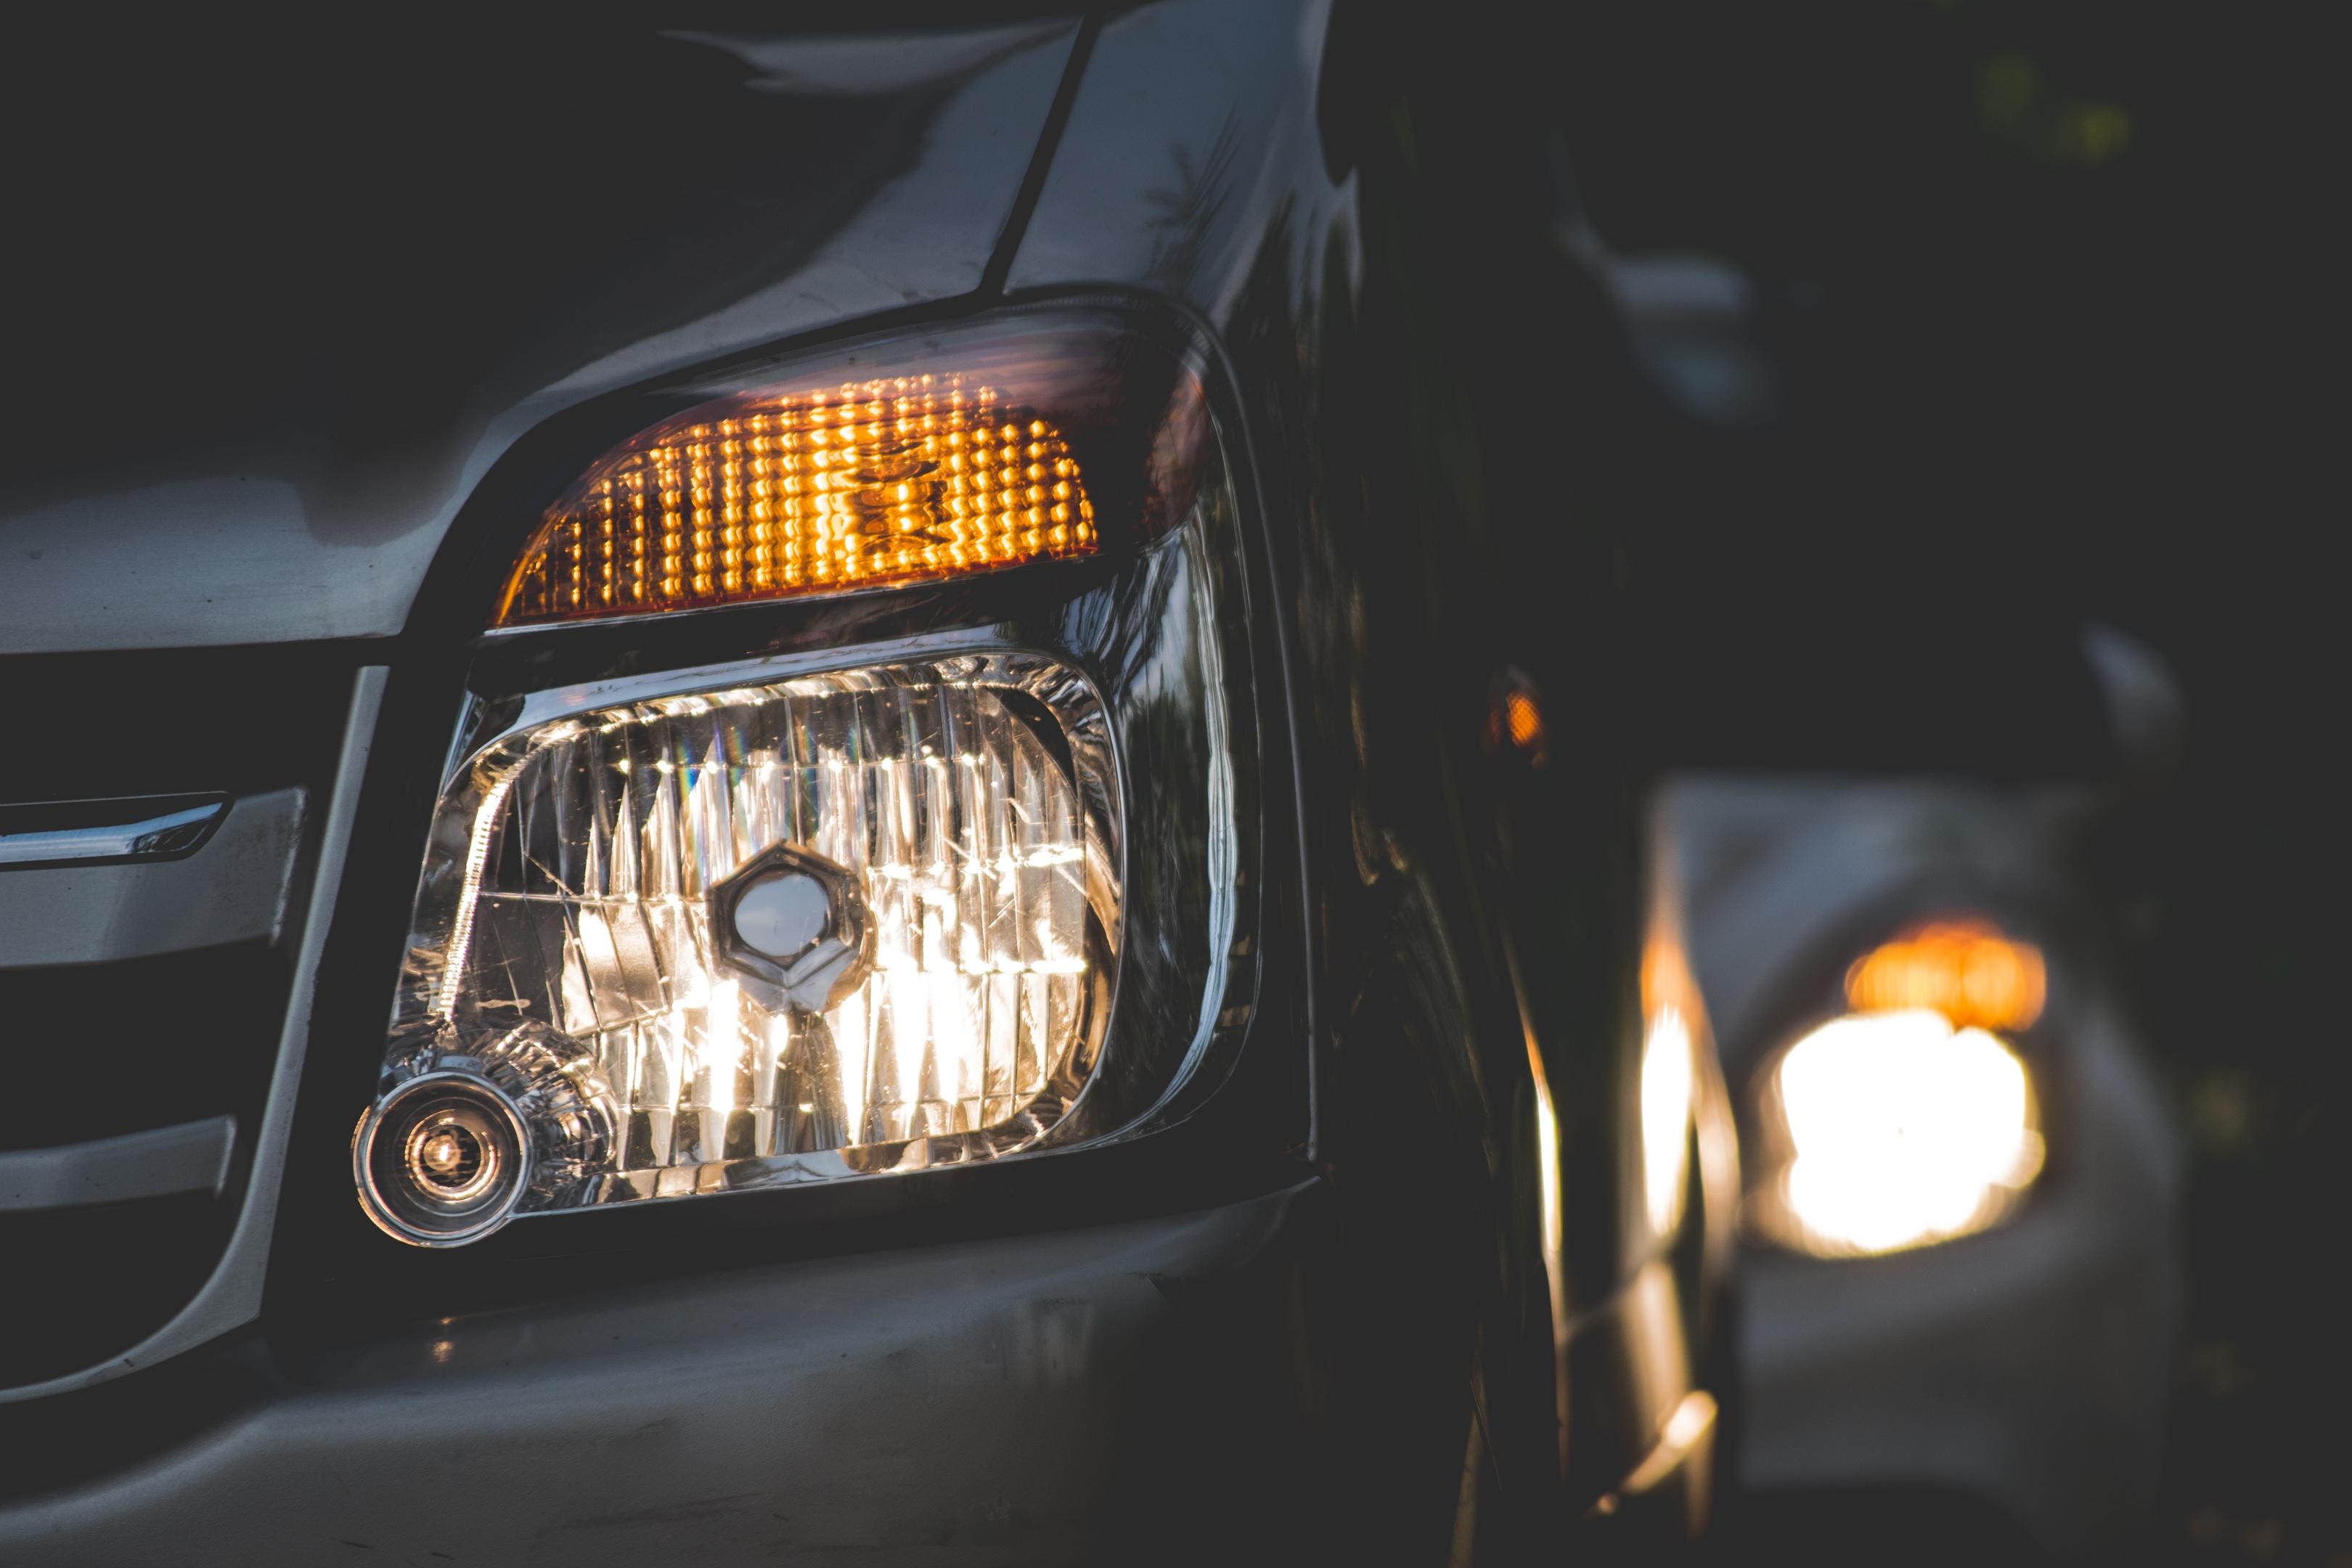 https://get.pxhere.com/photo/light-car-wheel-automobile-vehicle-headlight-lighting-headlamp-bumper-automobile-make-automotive-exterior-automotive-design-40423.jpg